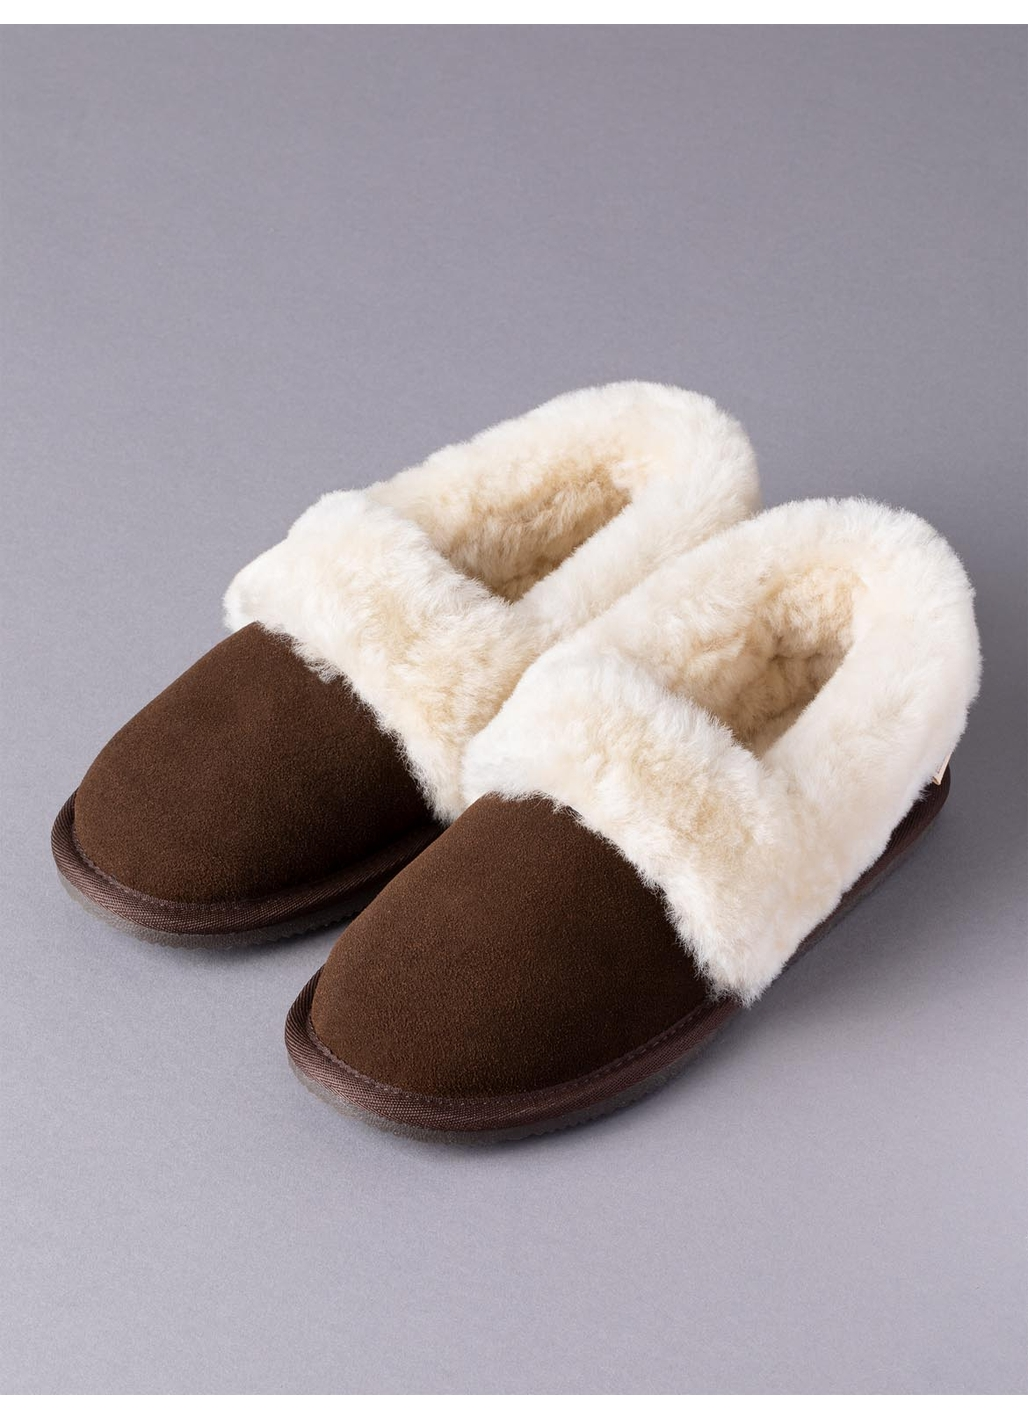 Ladies' Sheepskin Cuff Slippers in Brown